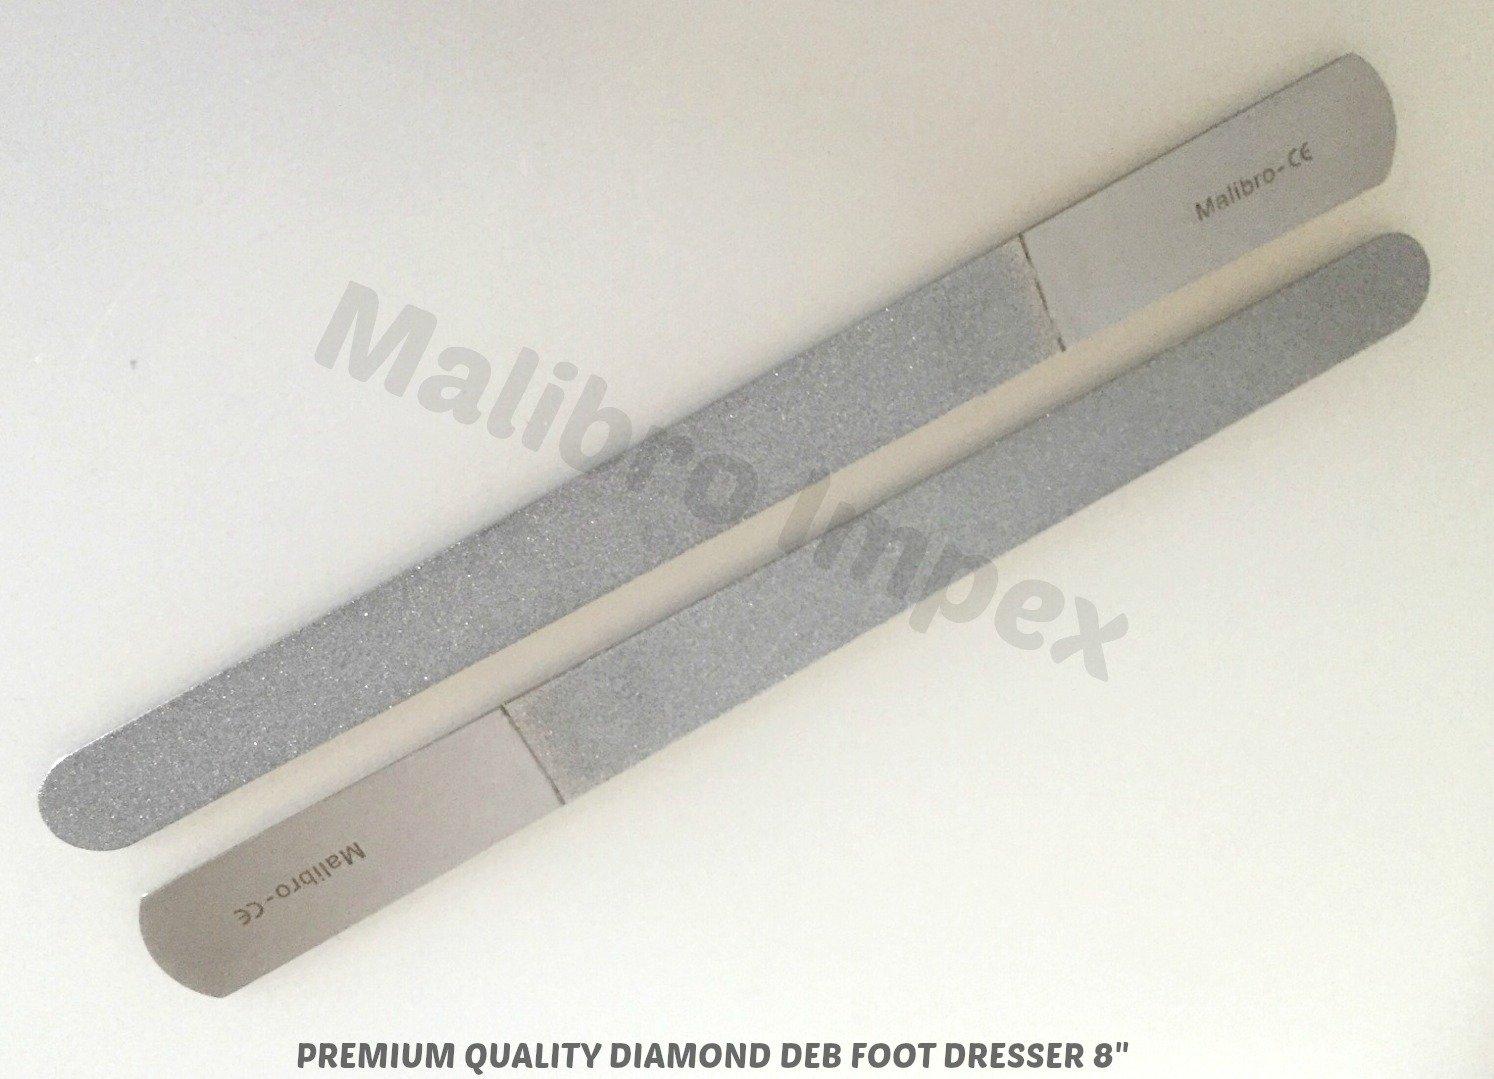 malibro® 1 x Diamant deb Fuß Kommode und Diamant deb Nagelfeile 20,3 ...